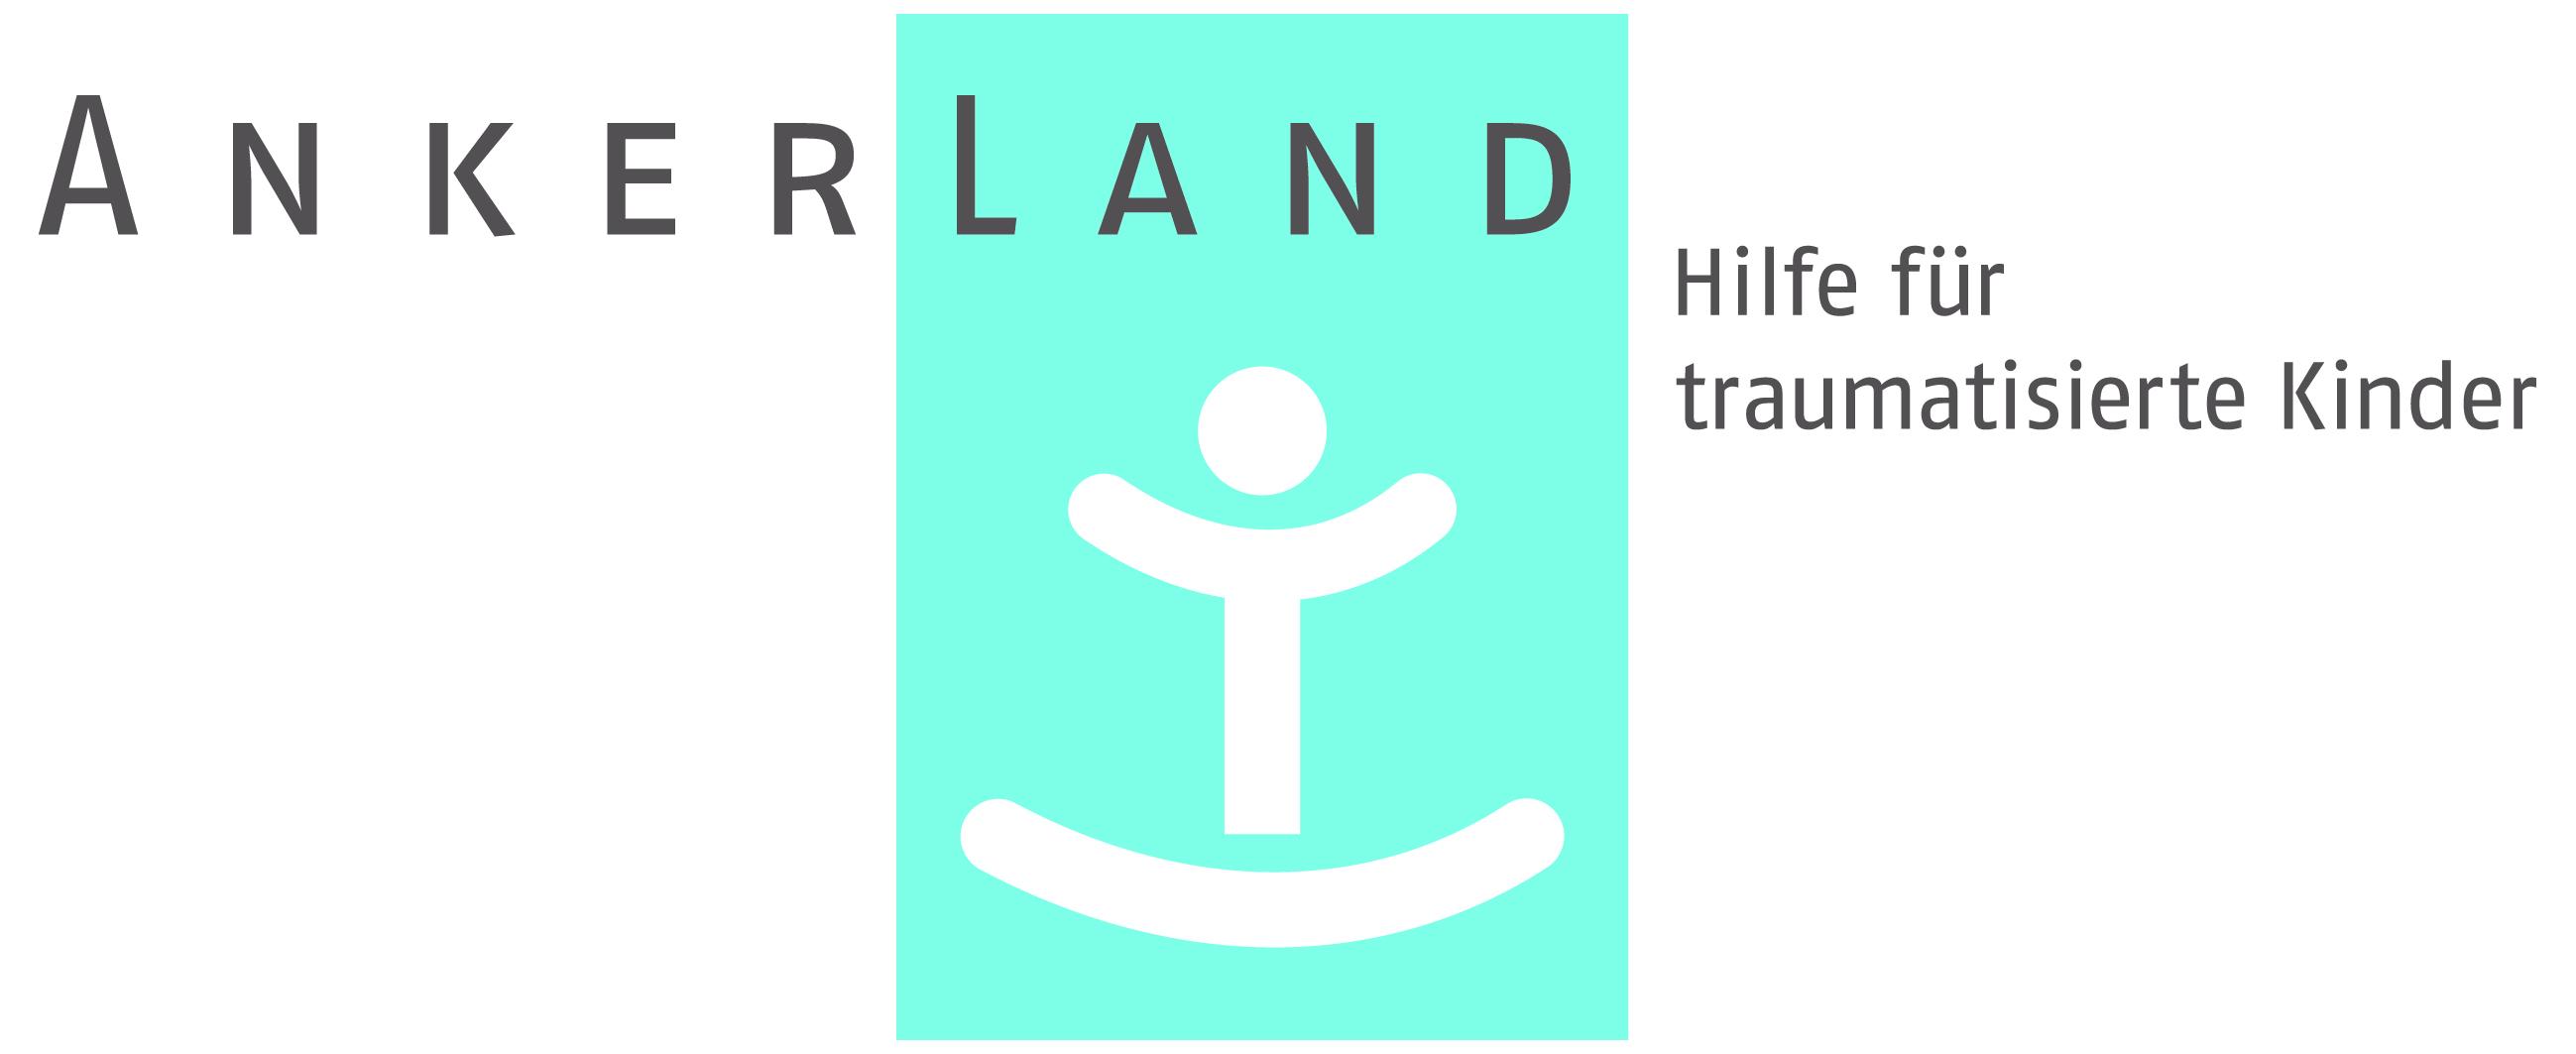 Ankerland